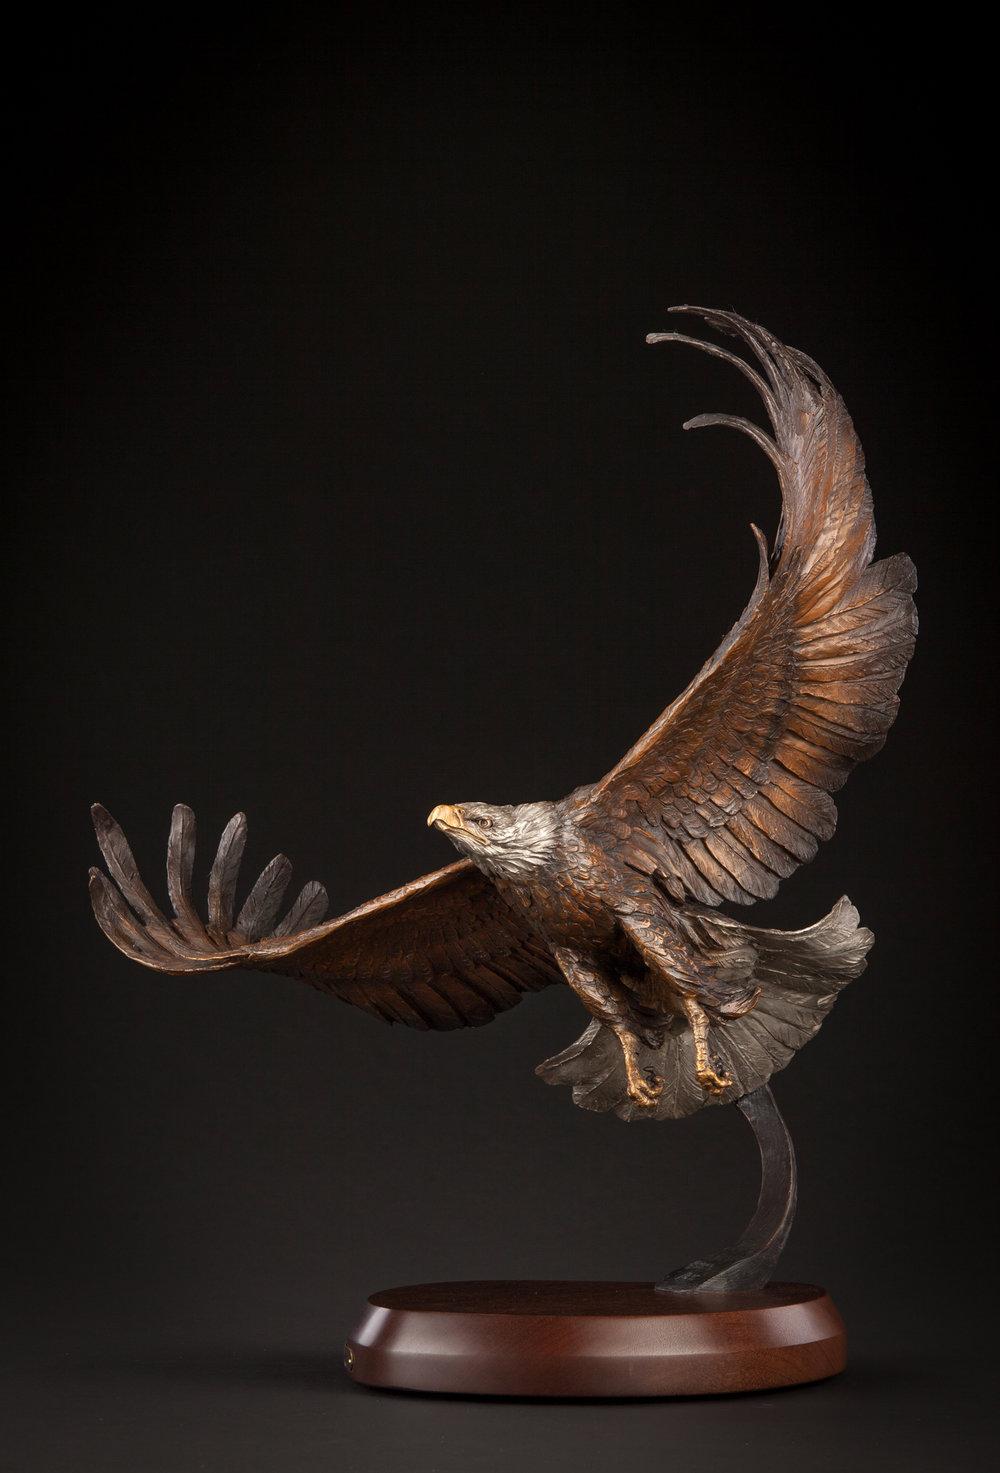 "Glory | 22"" x 28"" x 14"" | Bronze | Ltd Edition of 35 | $5,900"